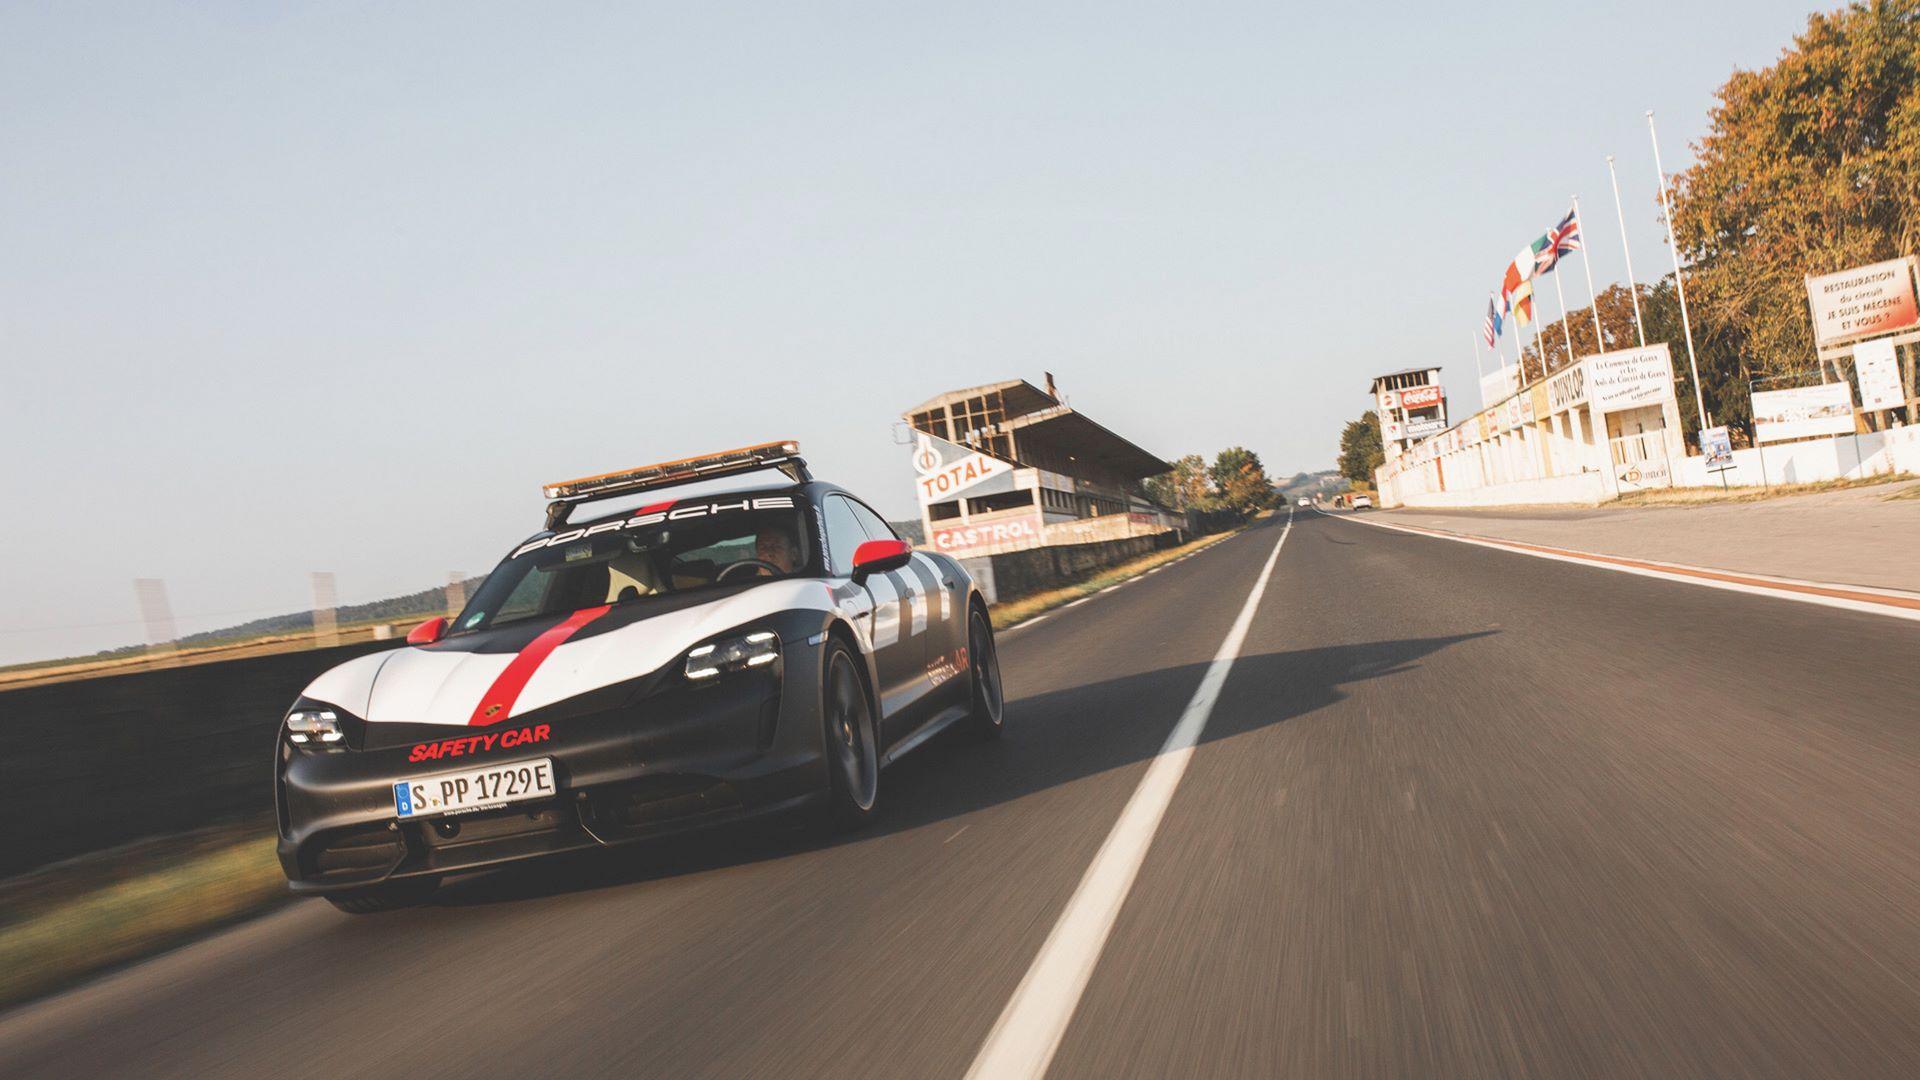 Porsche-Taycan-Turbo-safety-car-Le-Mans-2020-5